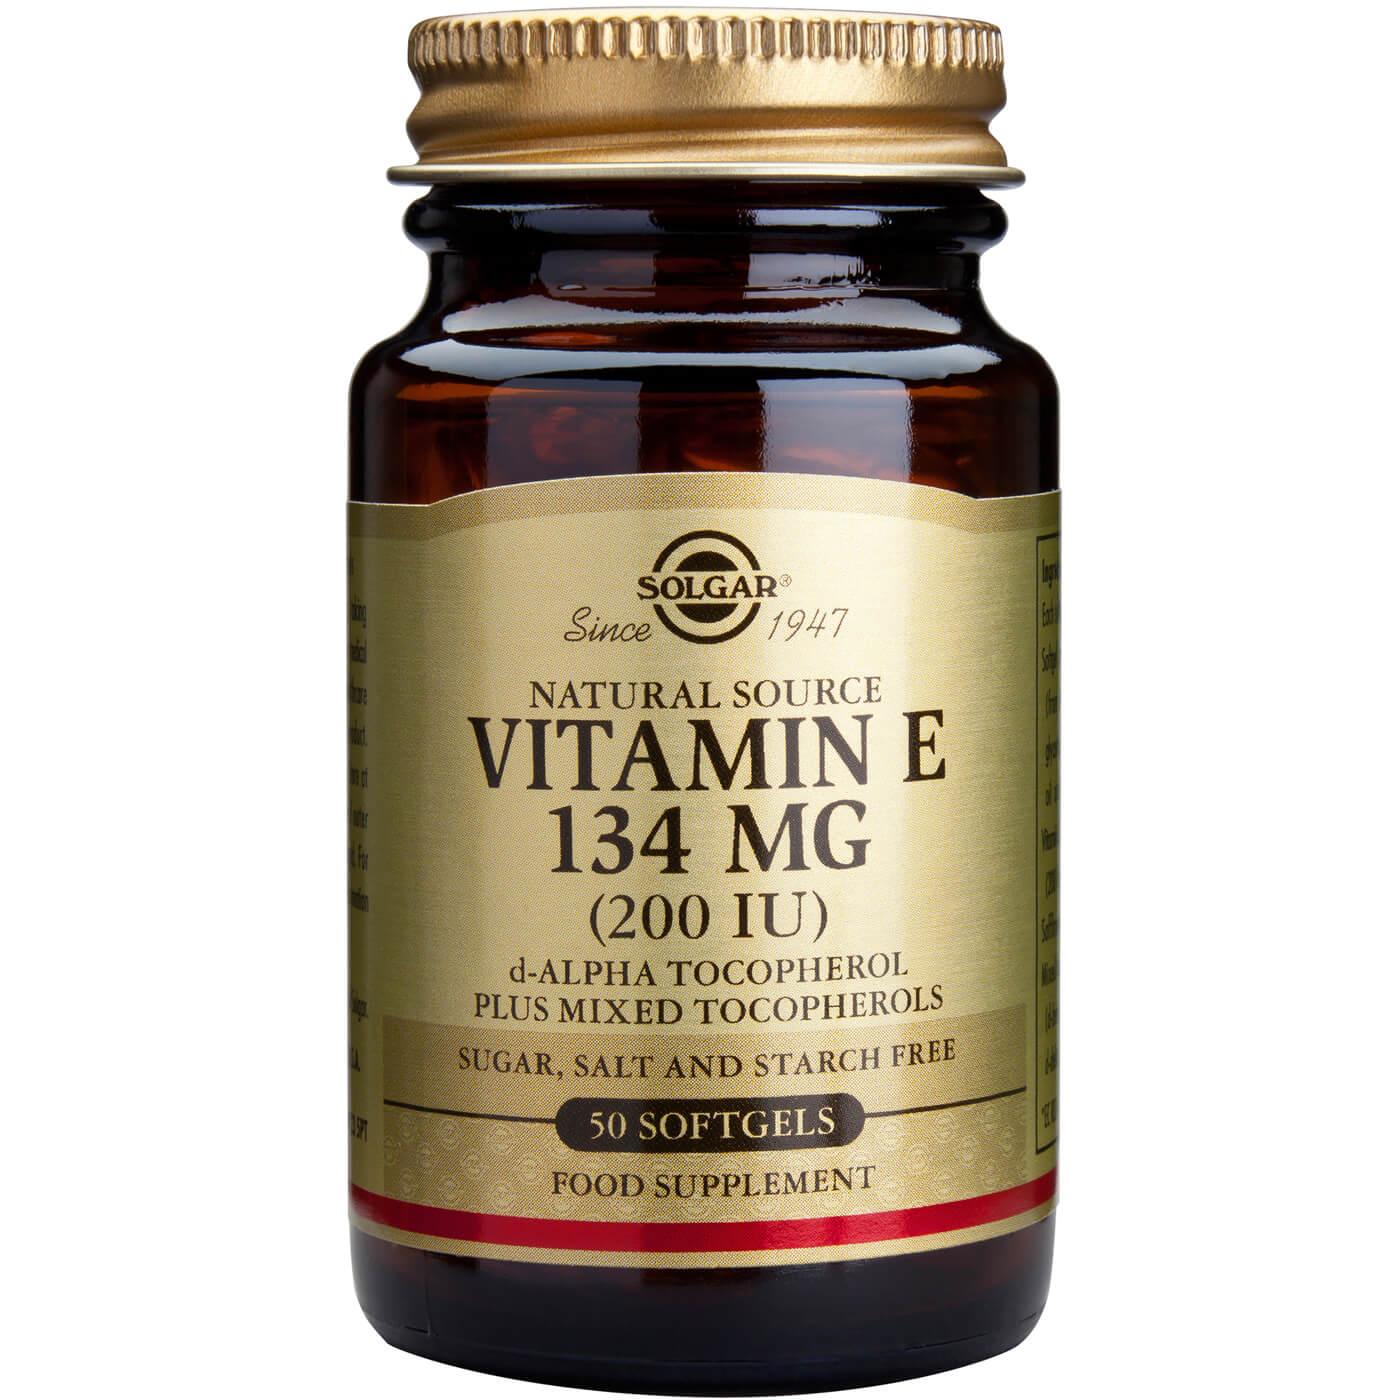 Solgar Vitamin E Συμπλήρωμα Διατροφής Φυσικής Πηγής Βιταμίνη Ε Πλούσια σε Αντιοξειδωτικά Natural softgels – 134mg 200iu 50s